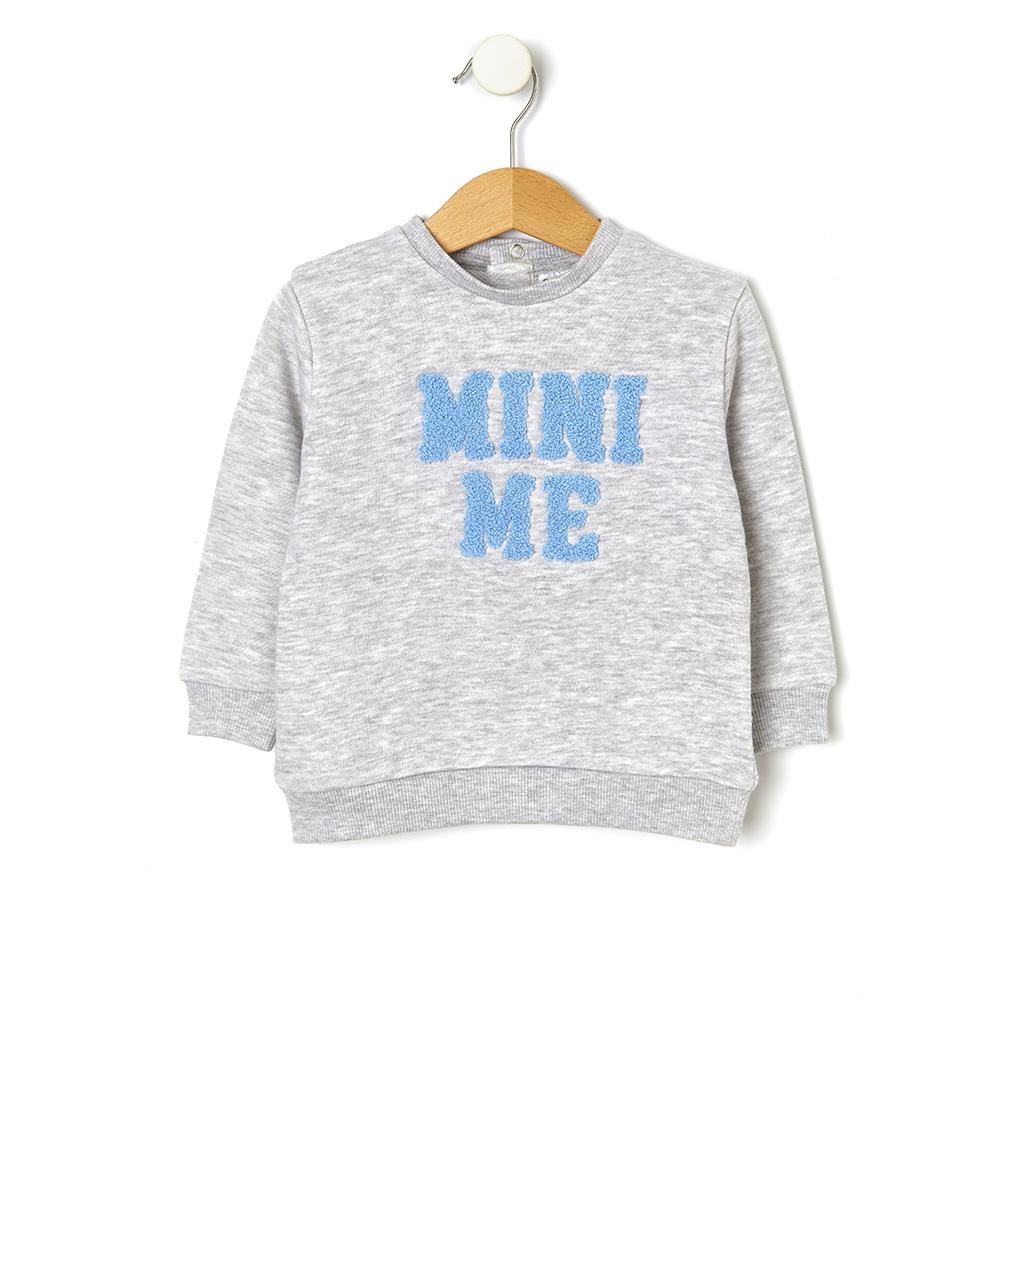 Felpa mini me - Prénatal